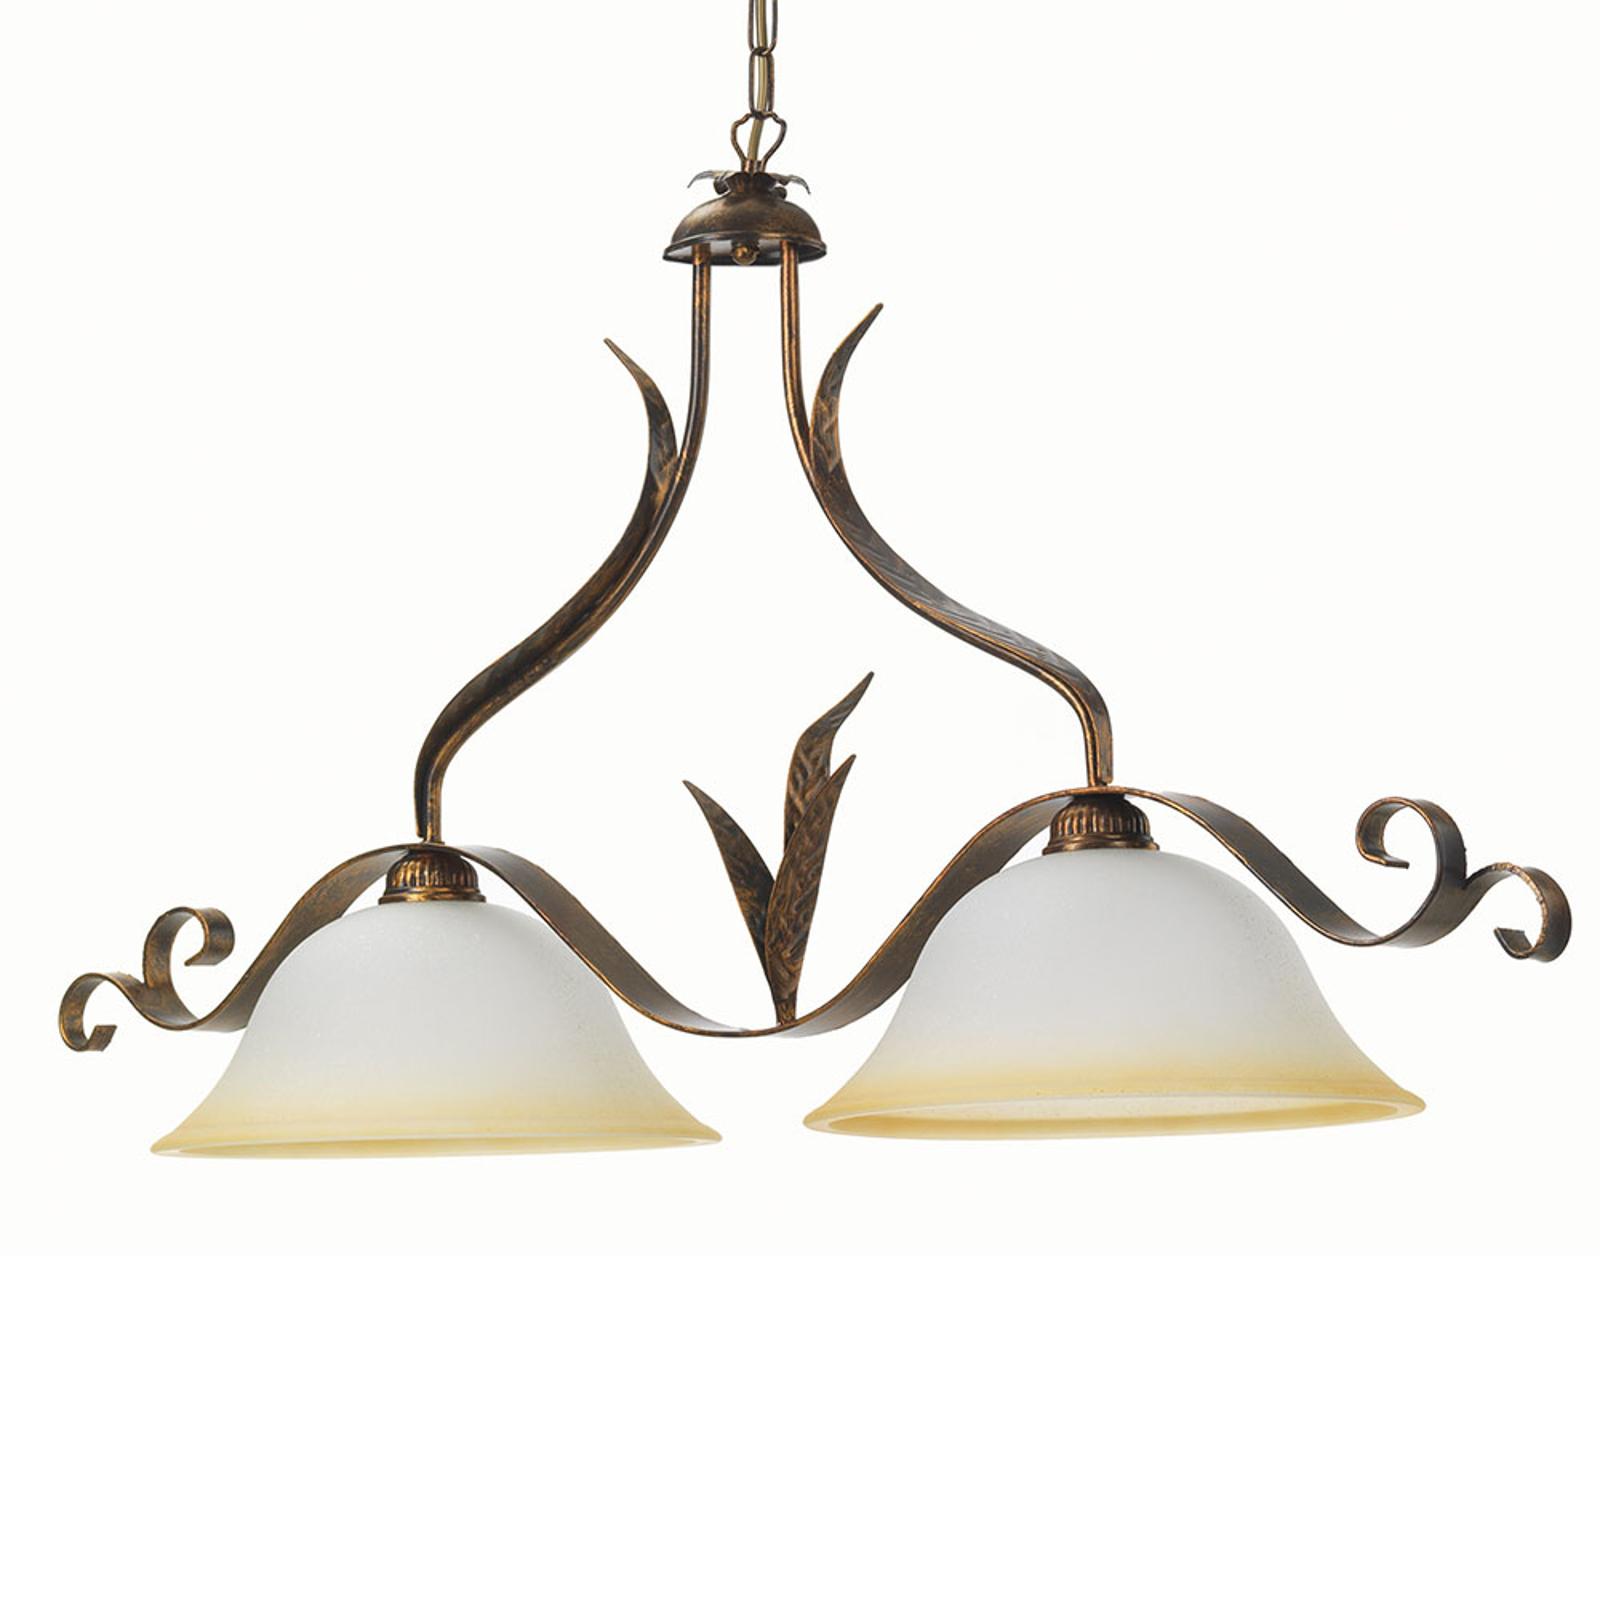 Hanglamp Biliardo 2-lamps crèmewit/brons